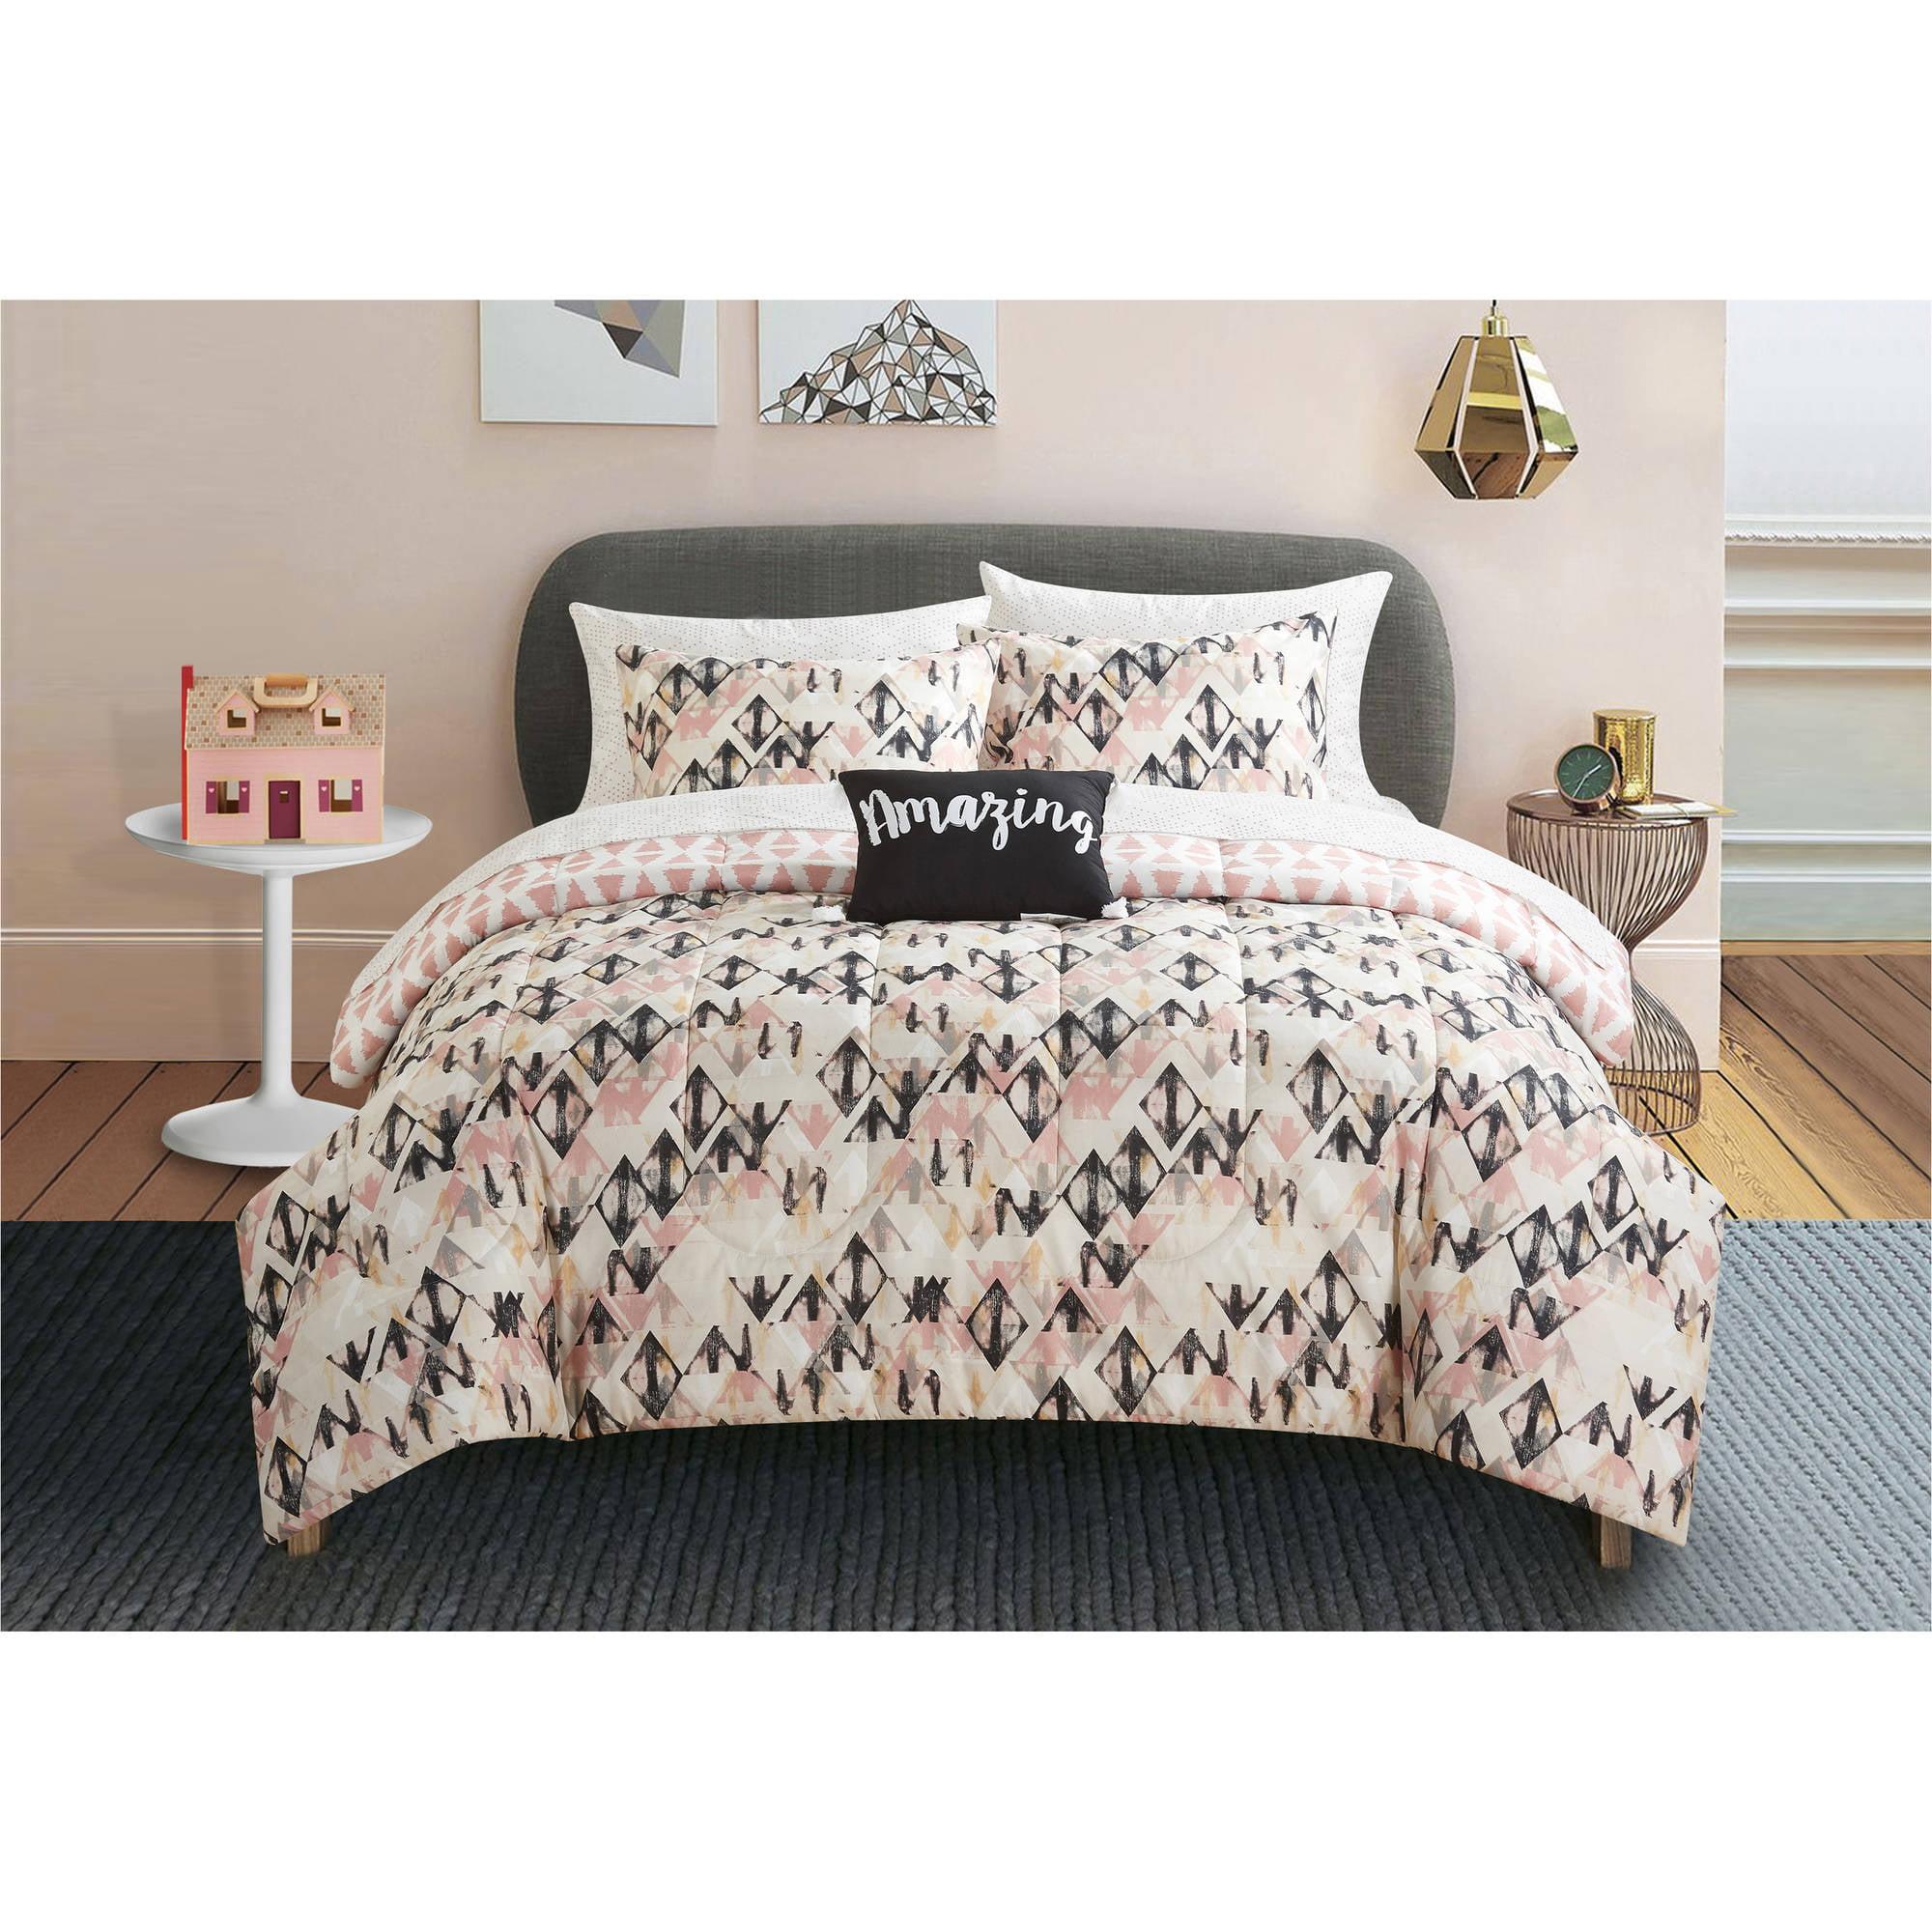 Formula Mad Diamond Bed in a Bag Bedding Set Walmart